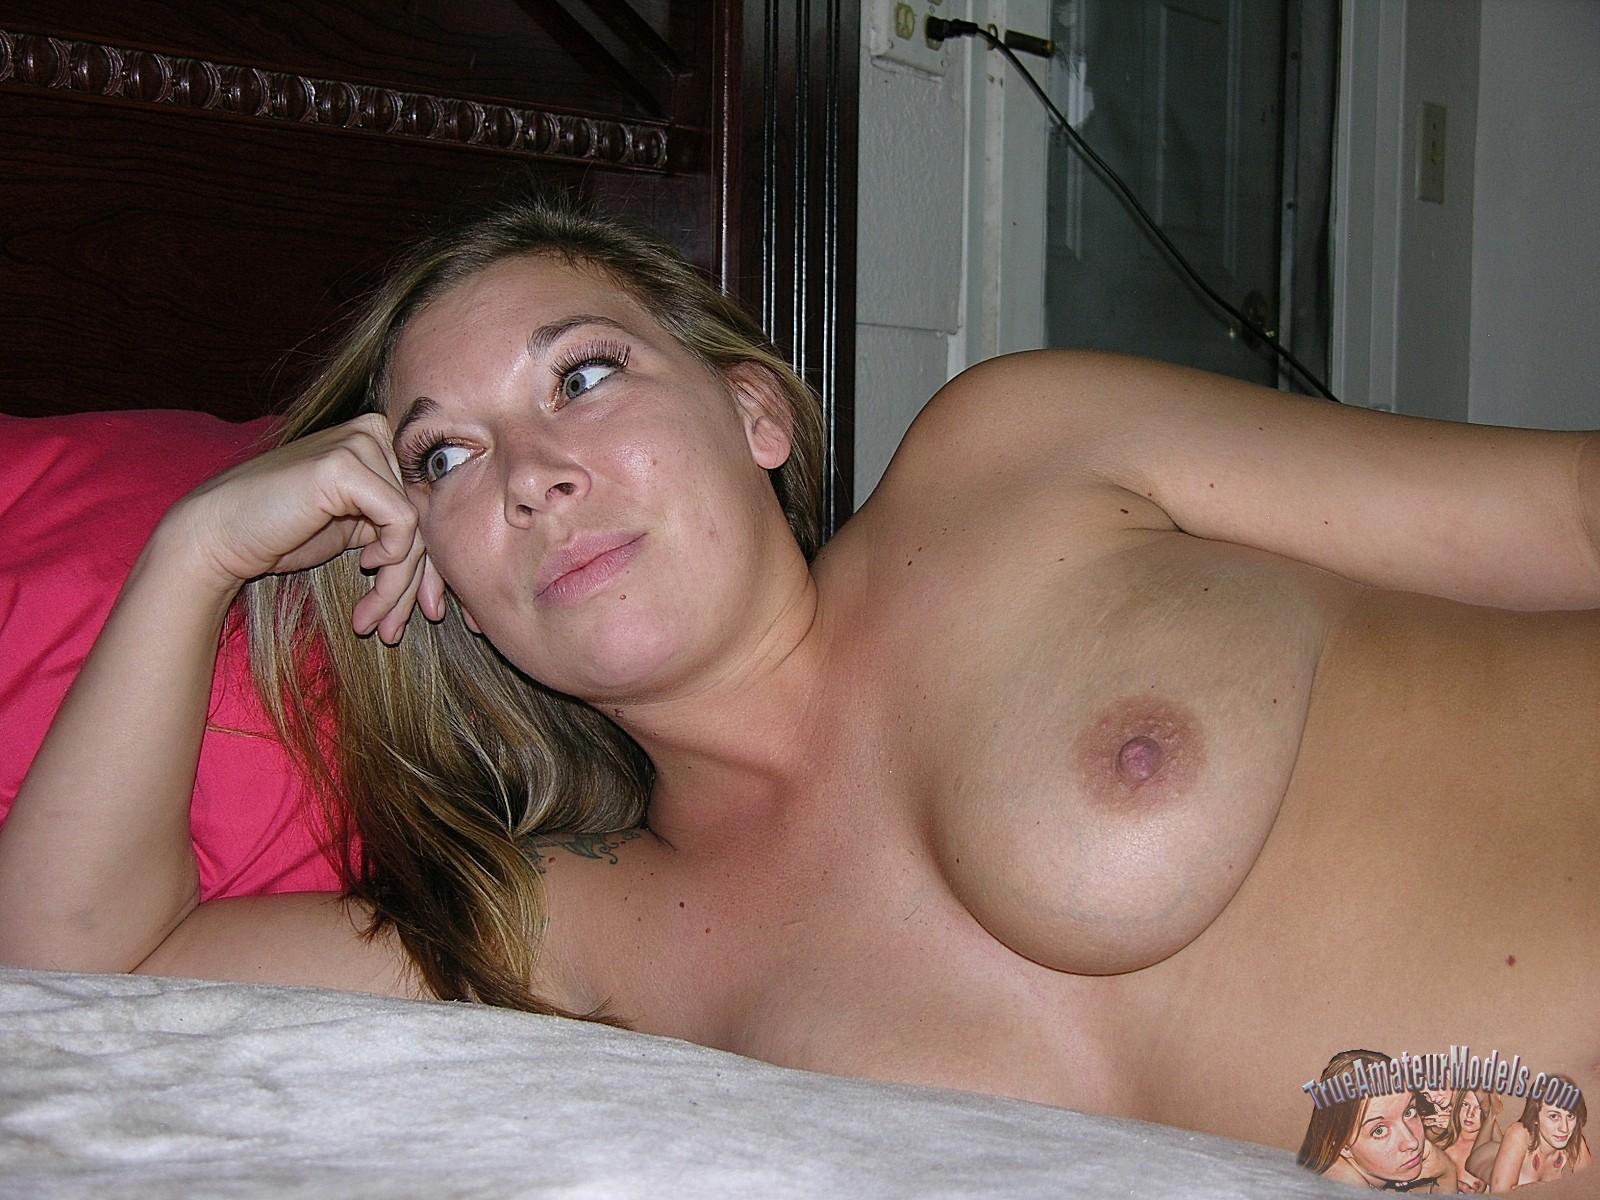 big-tits-valerie-model13